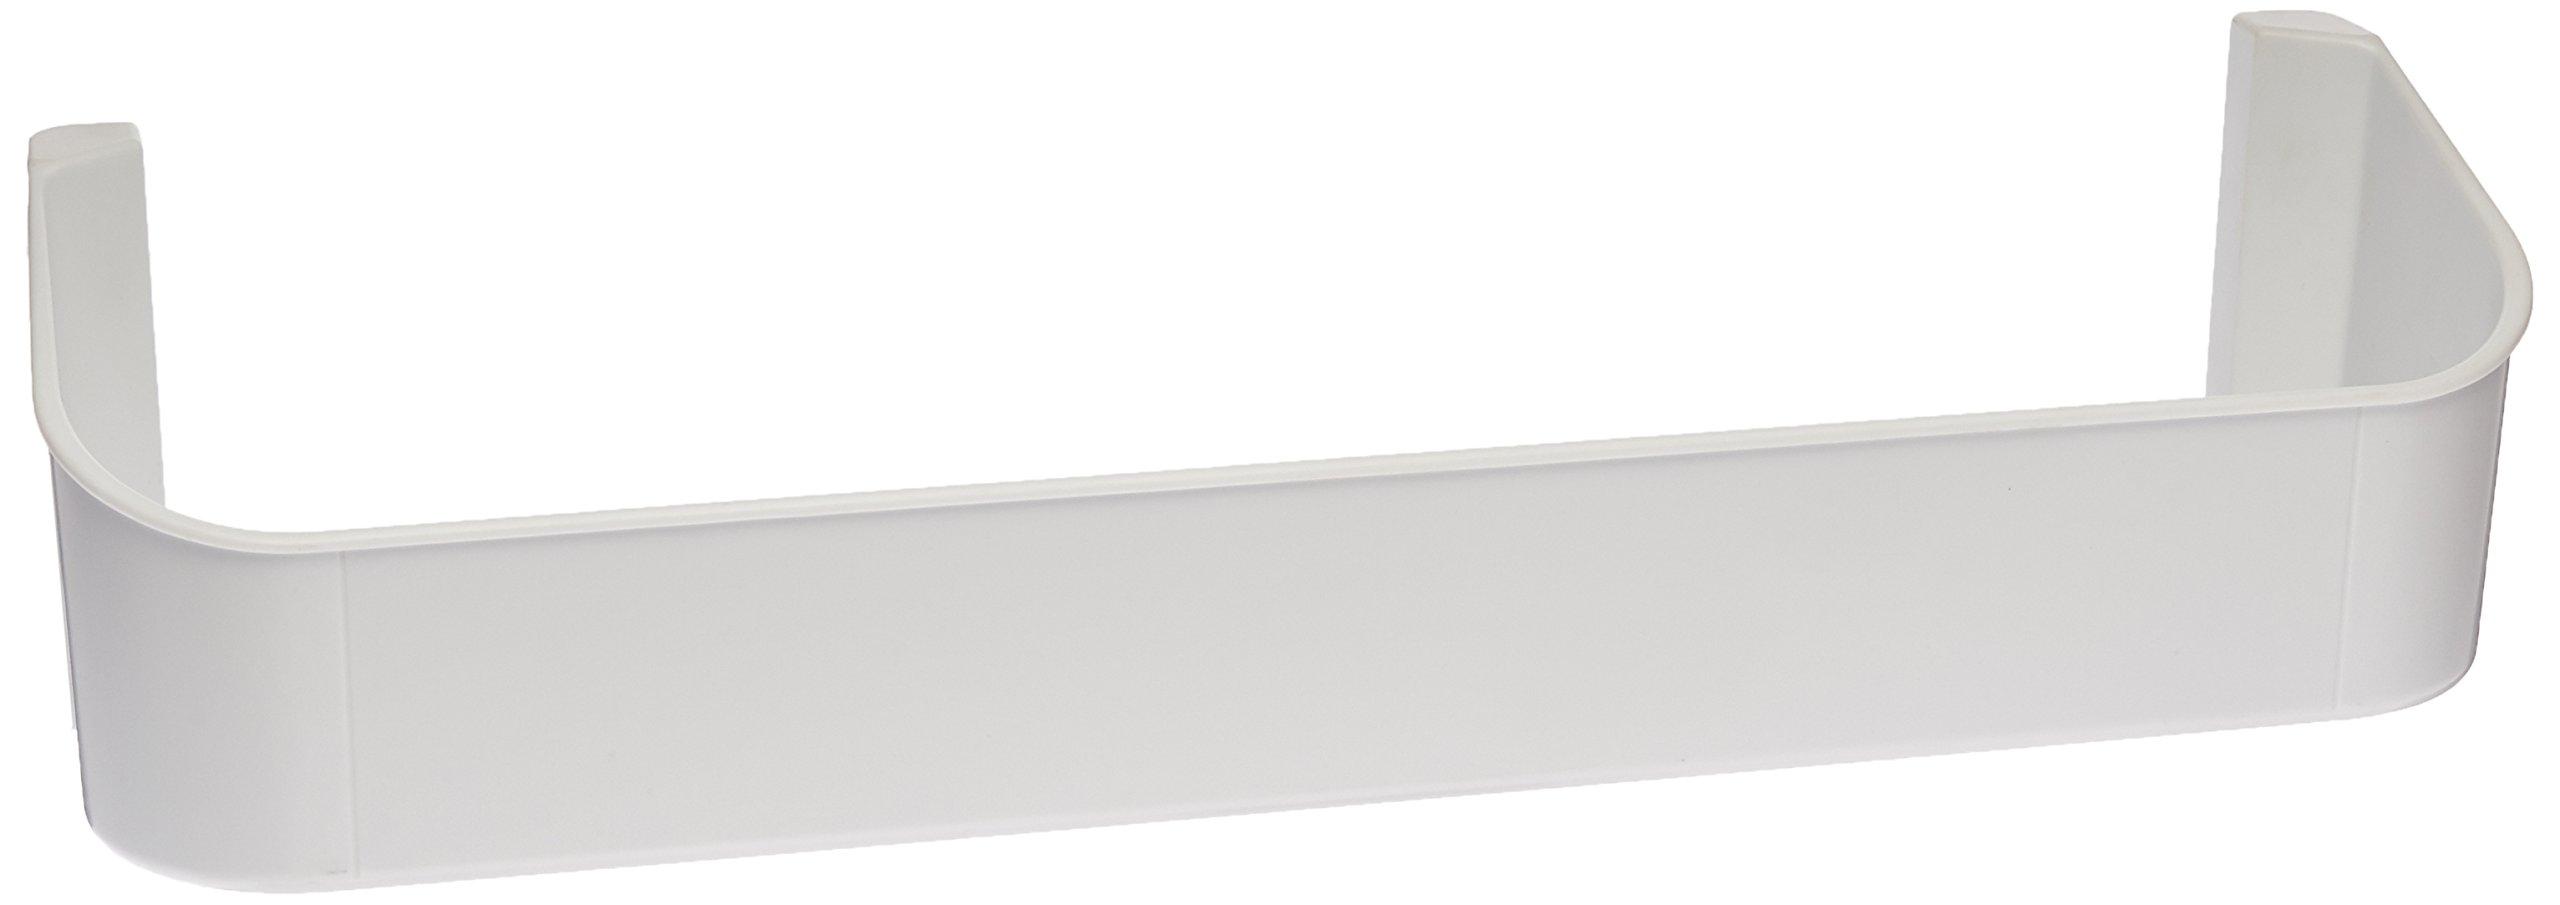 Dometic 2932575018 White Lower Shelf